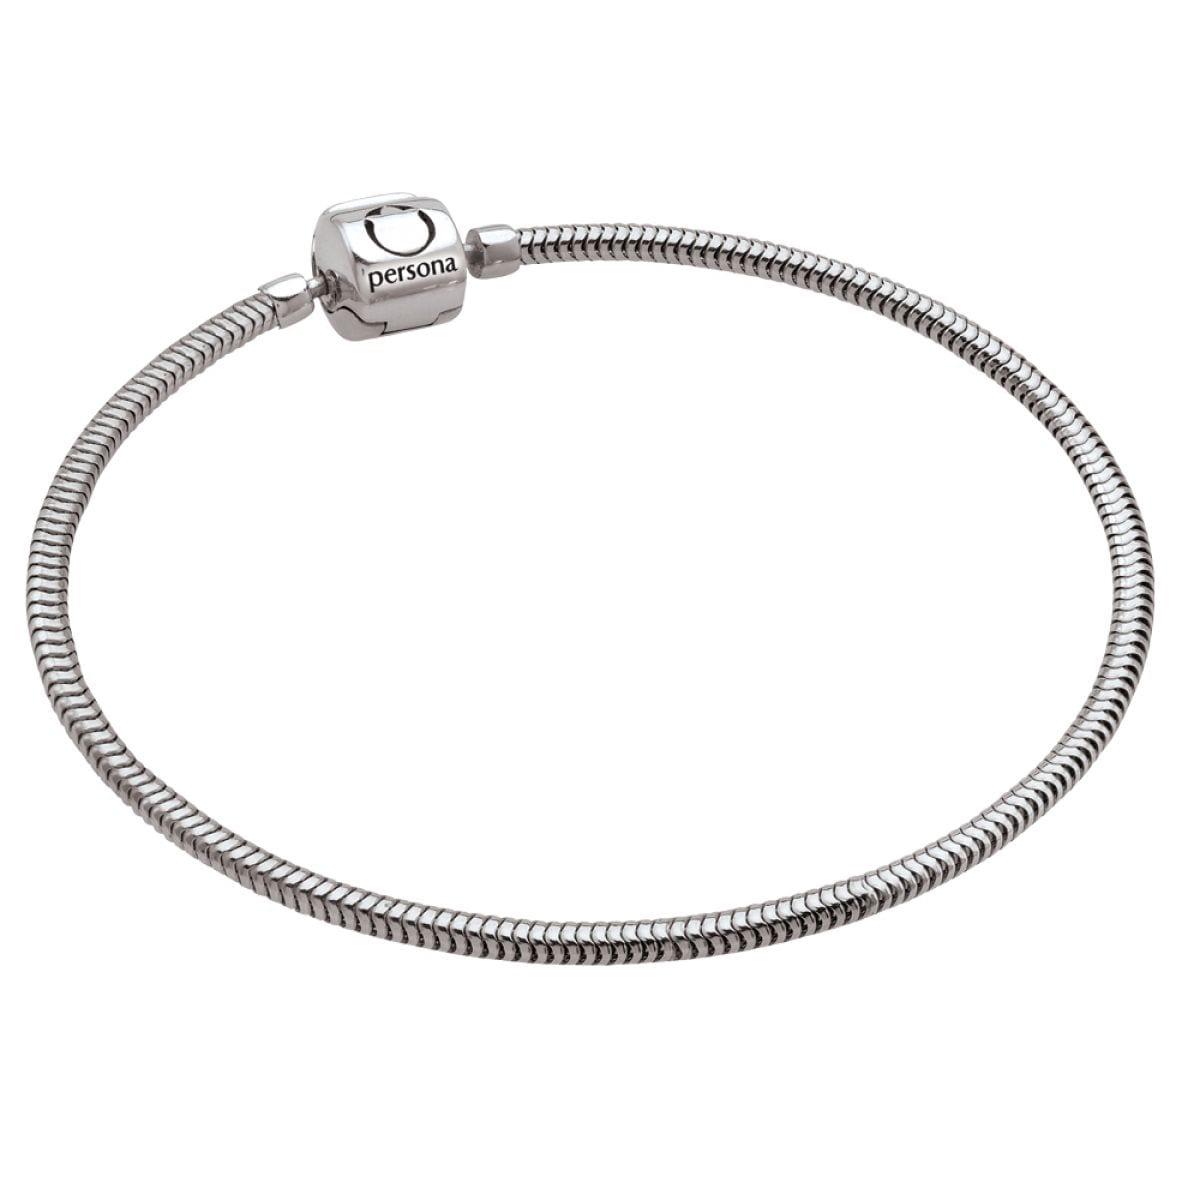 3f1736b85 Ladies Persona Sterling Silver Charm Bracelet - Bocian Jewellers